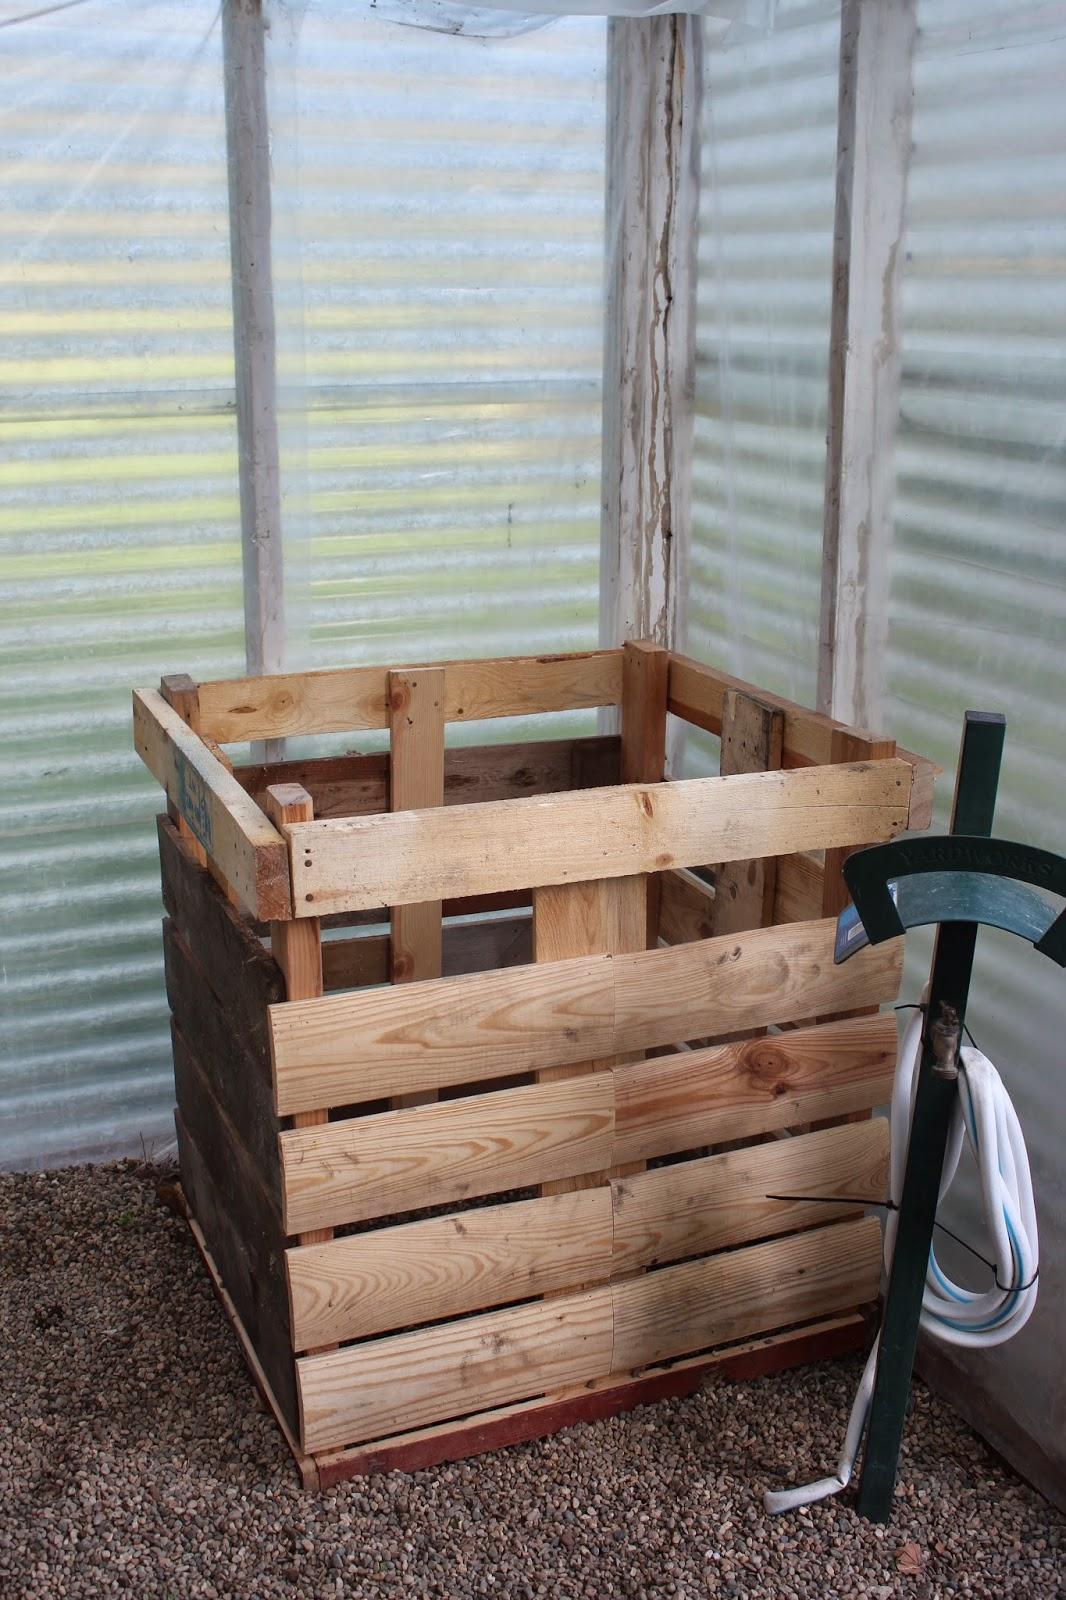 IMG 4673 - DIY Compost Bin